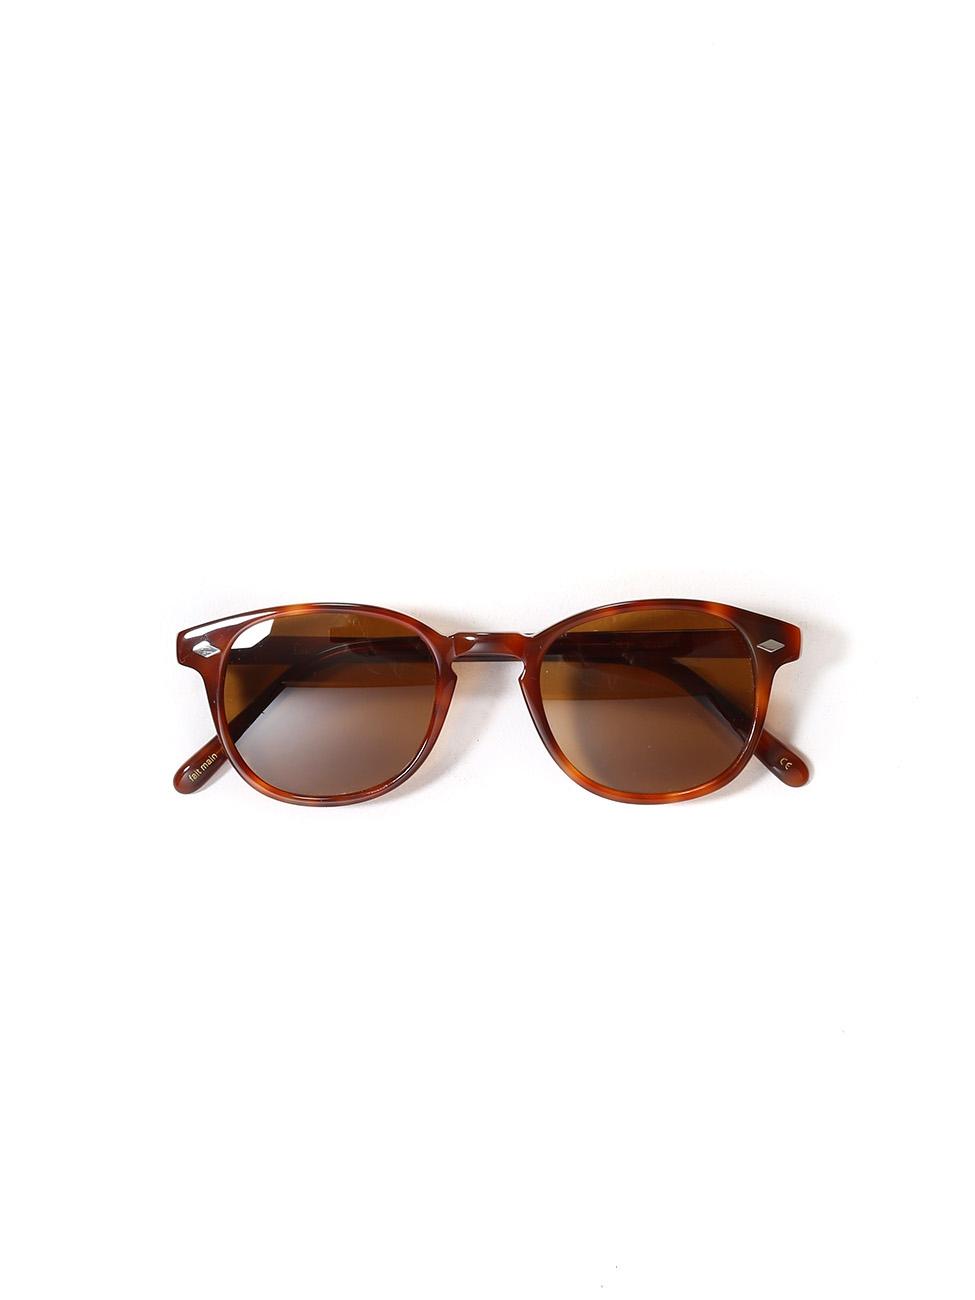 0c914845263 ... LA 711 camel tortoiseshell frame luxury sunglasses with brown lenses  Retail price €260 NEW ...